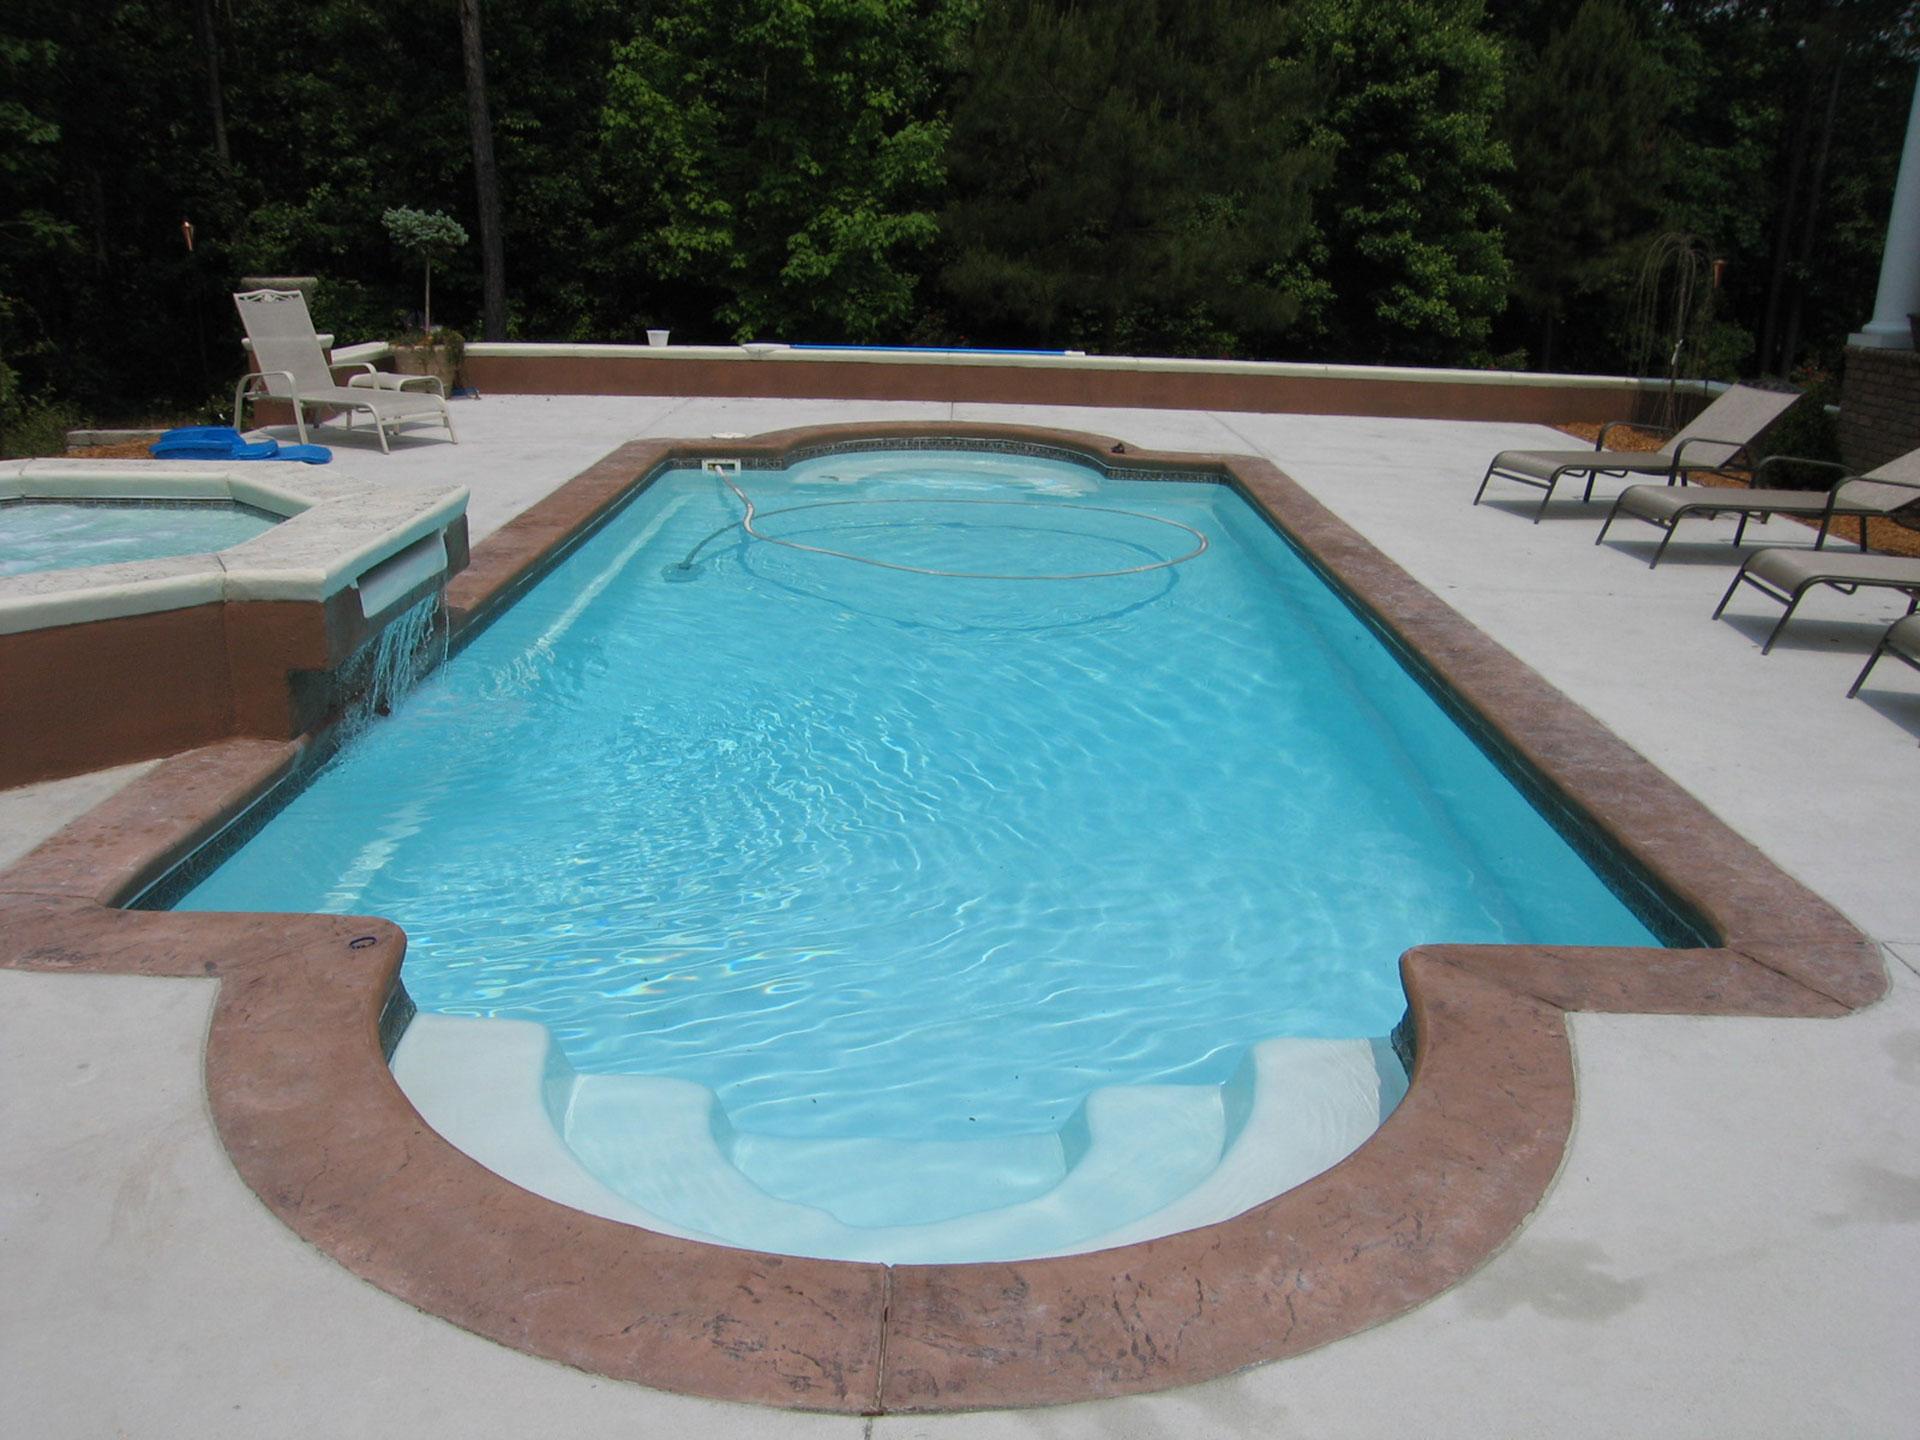 Fiberglass Pool And Spa Combination